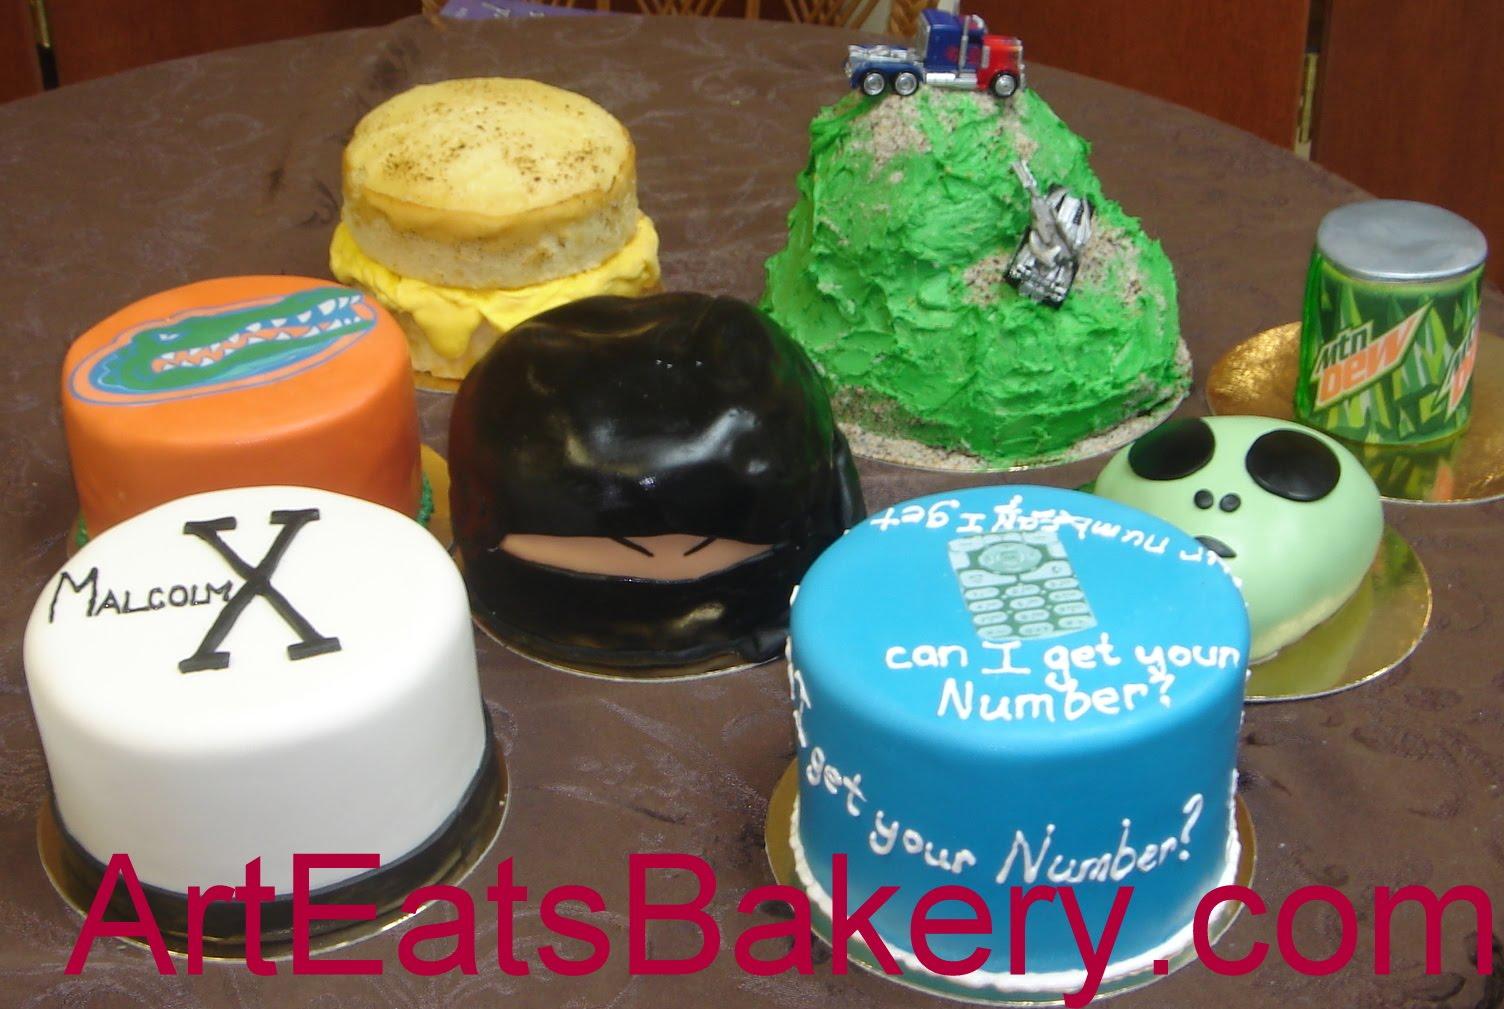 Astonishing Eight Tiny Specialty Cakes For A Special Guy Arteatsbakery Funny Birthday Cards Online Kookostrdamsfinfo